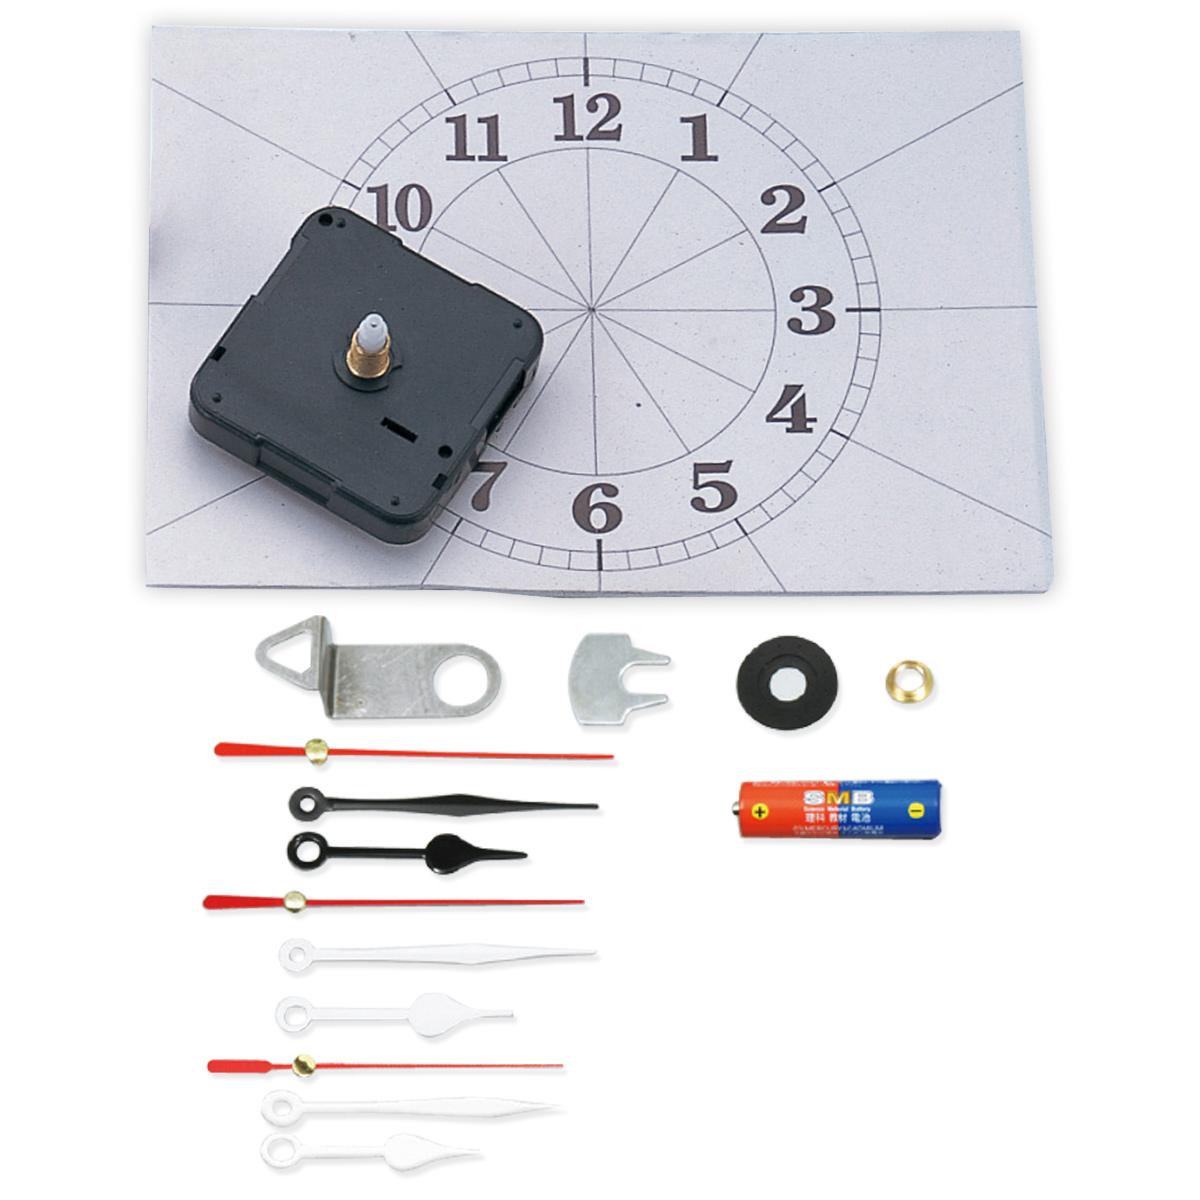 クォーツ時計 Aセット 青箱 工作 美術 学習教材 小学生 手作り 時計 夏休み 宿題